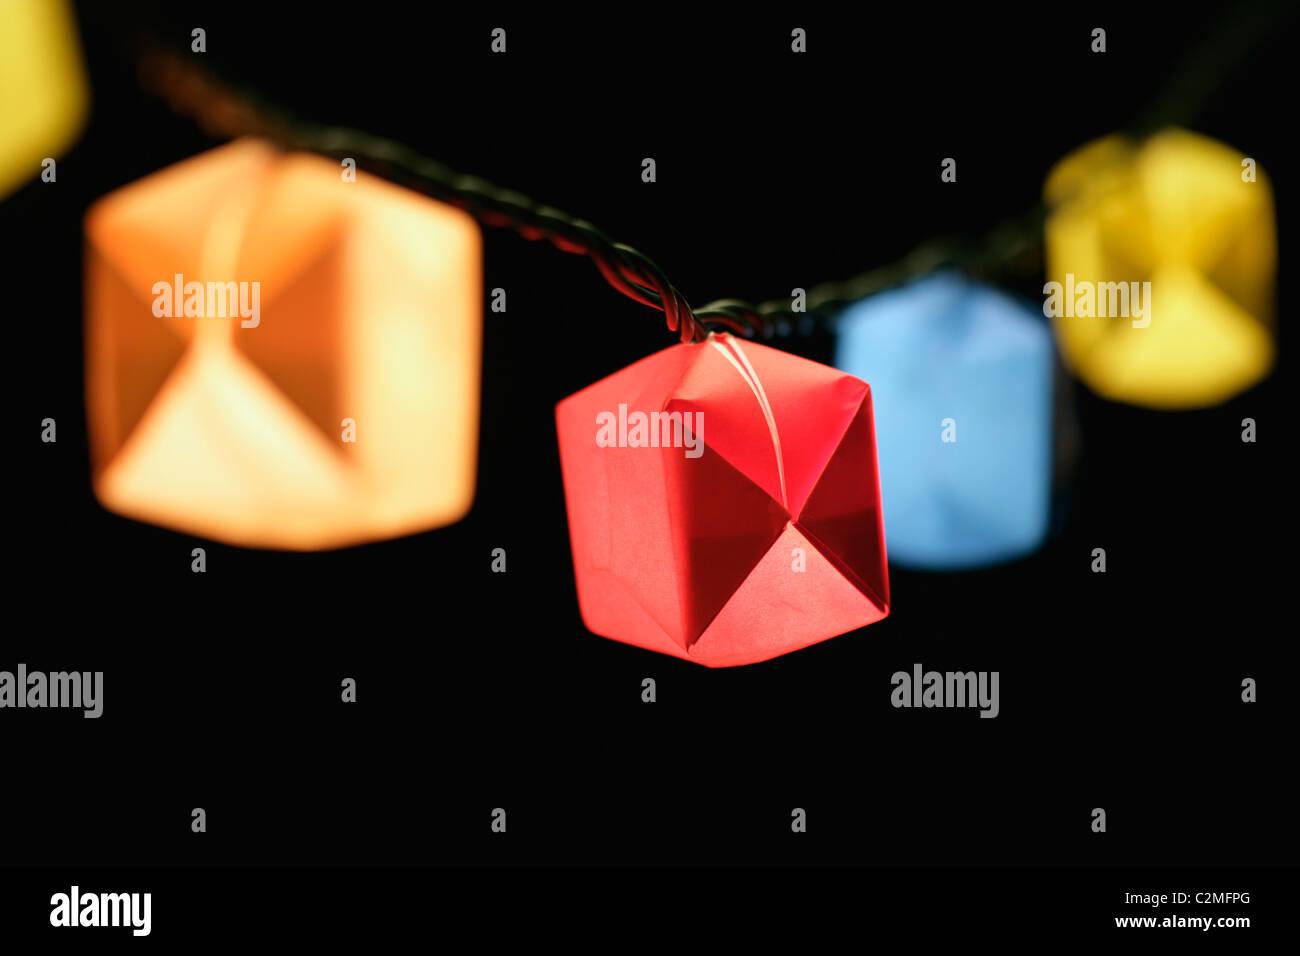 Origami - Stock Image